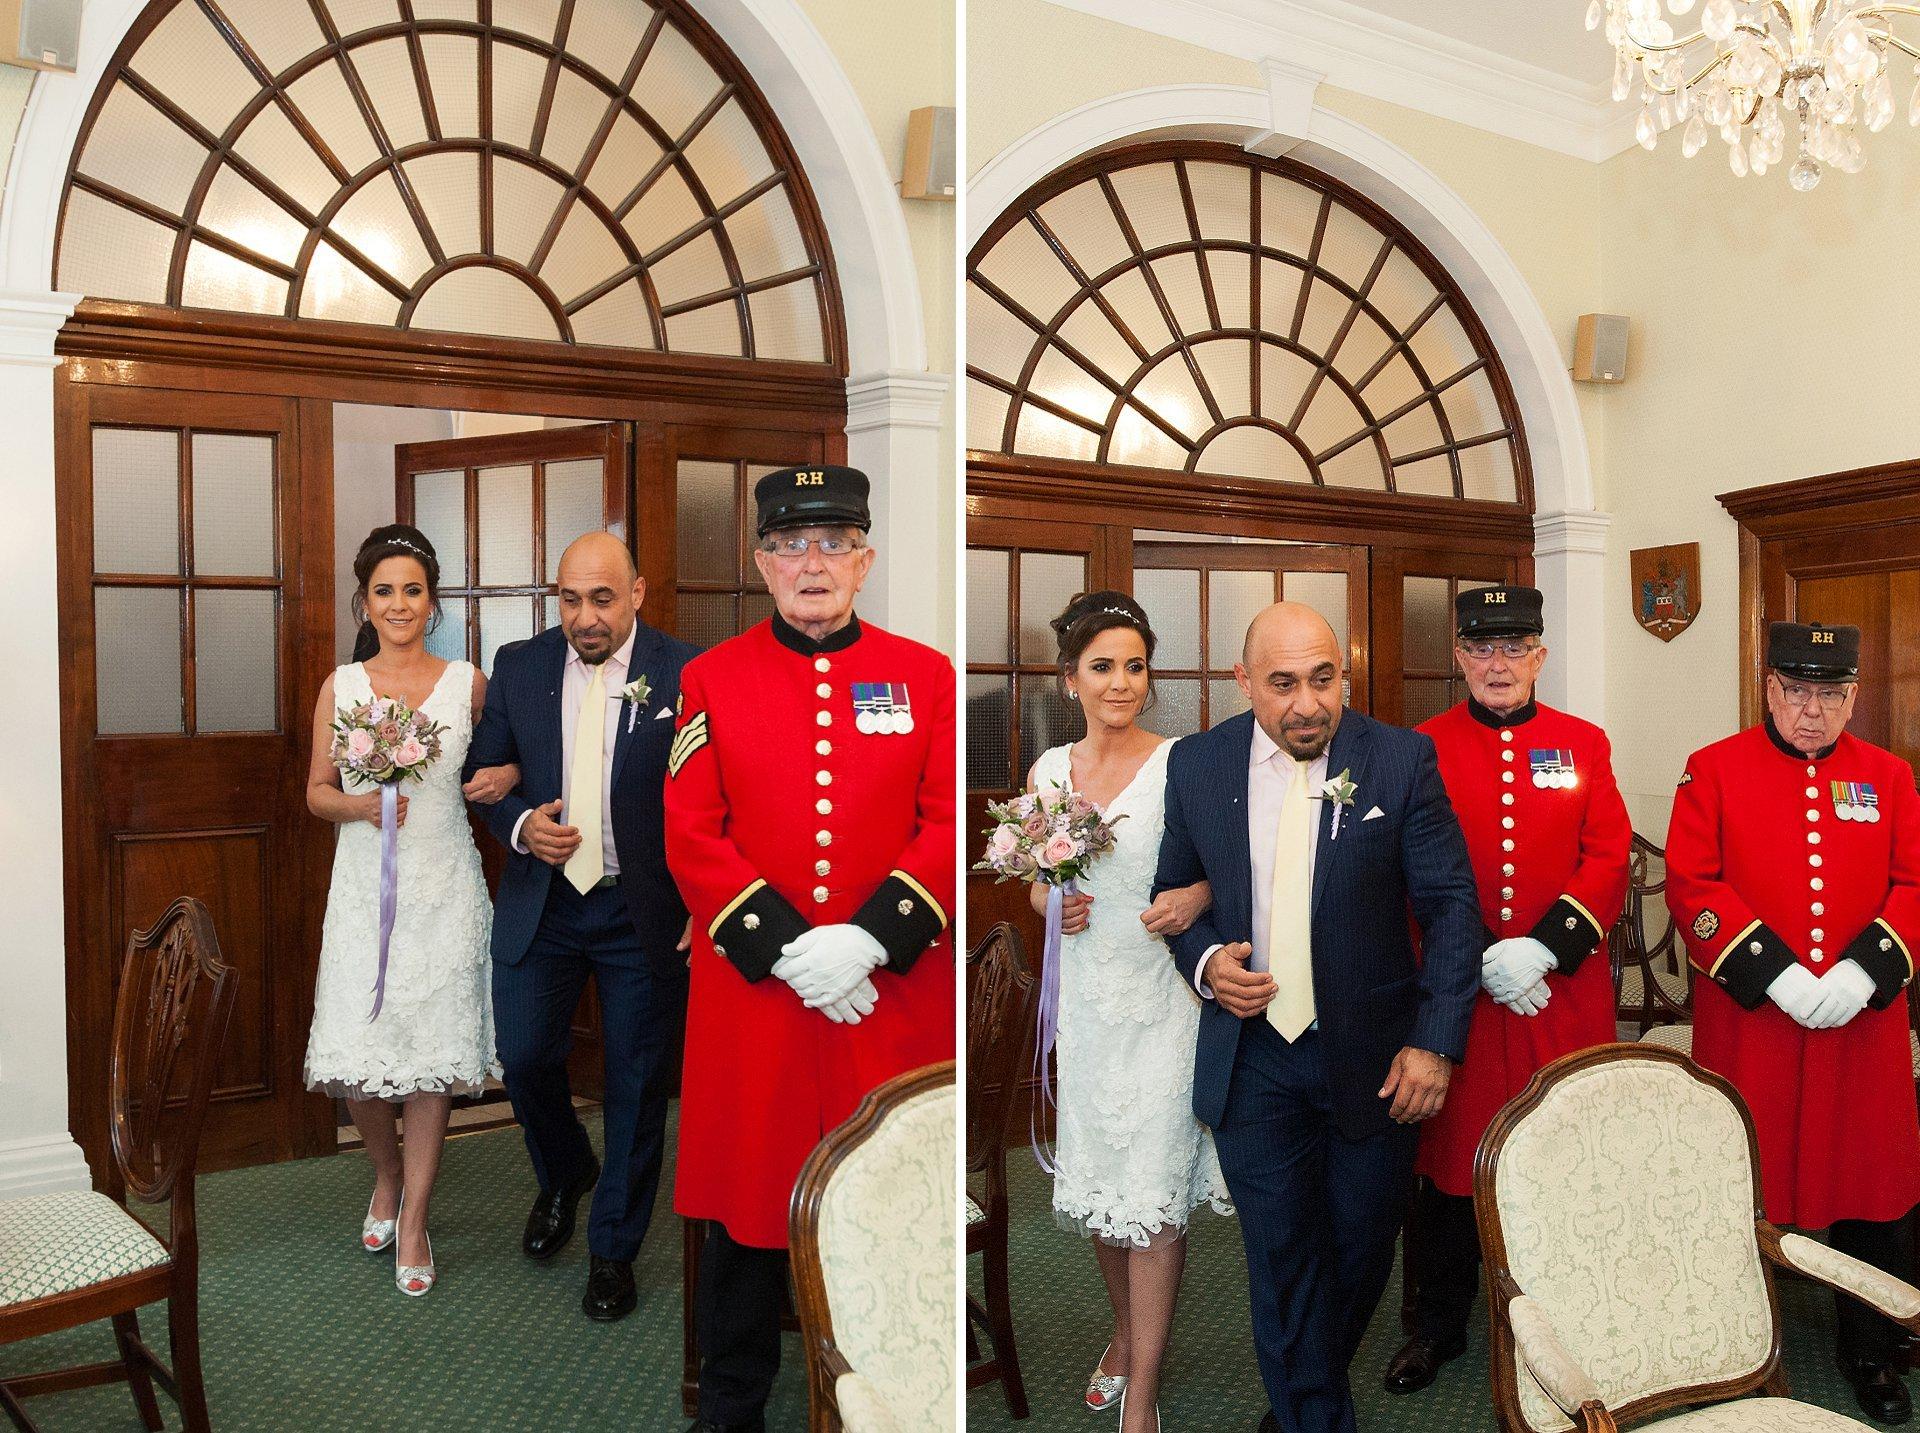 Bride & groom enter the Rossetti Room in Chelsea Registry Office